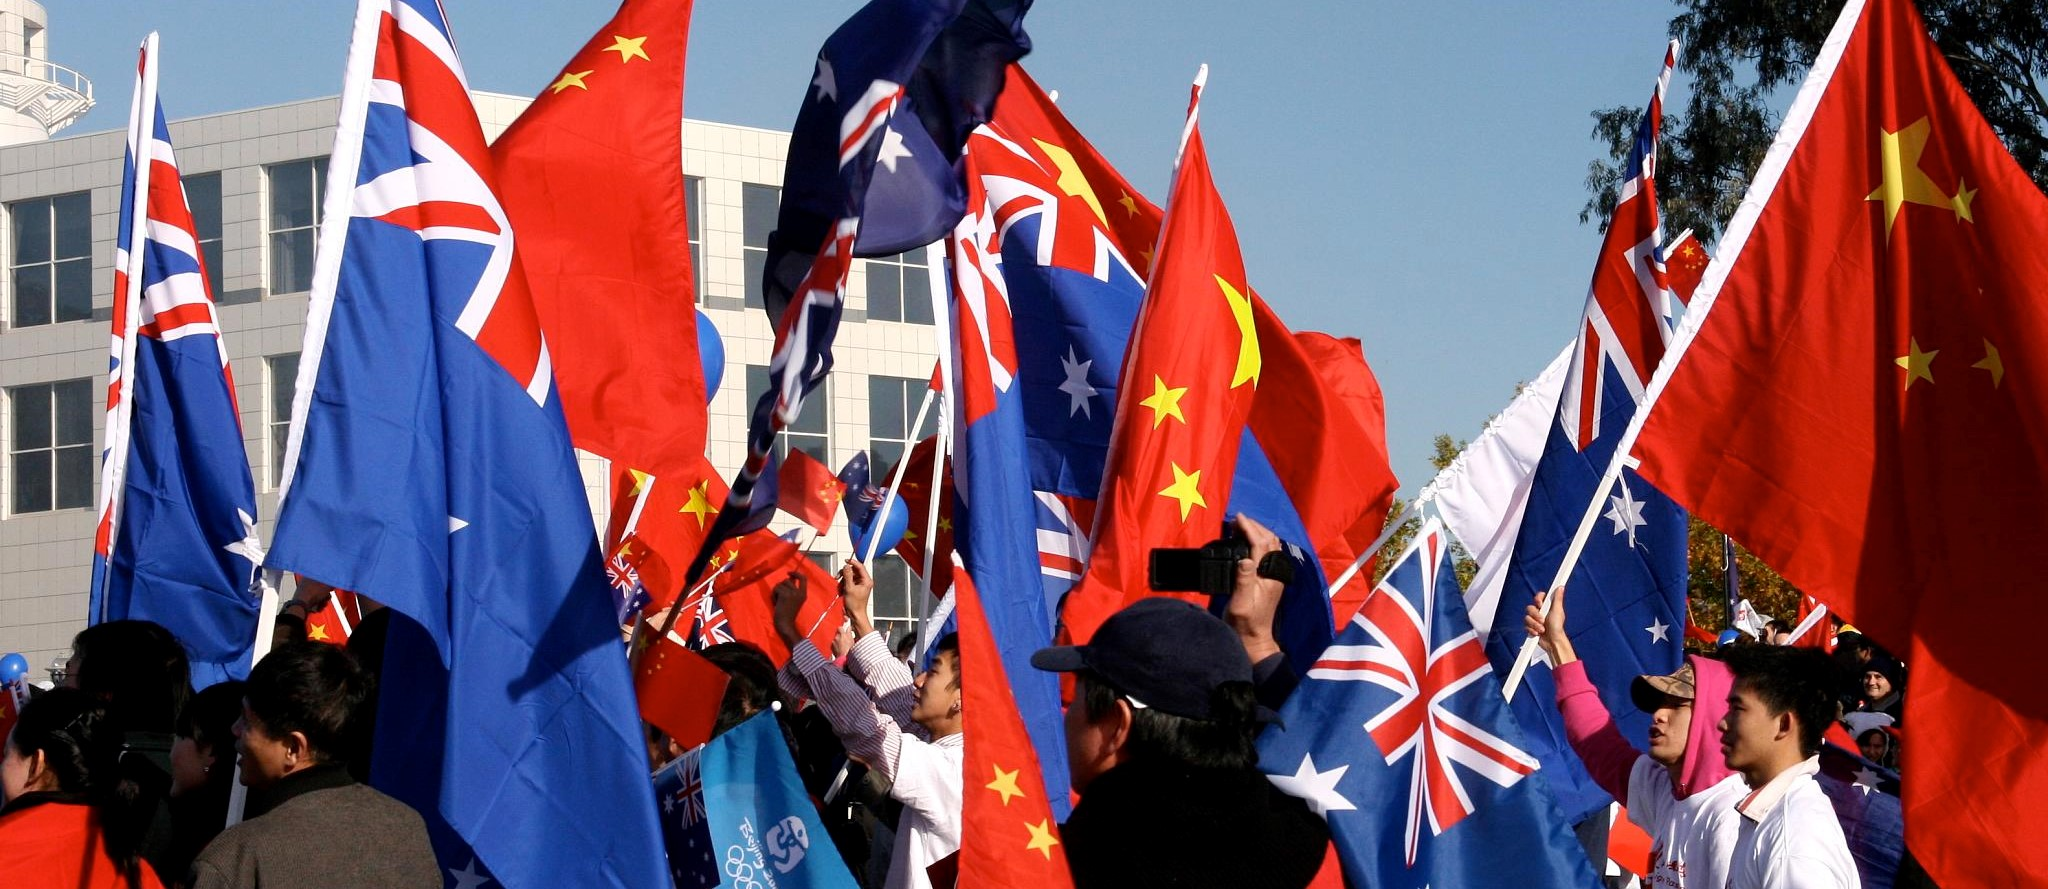 chinese australian relations essay